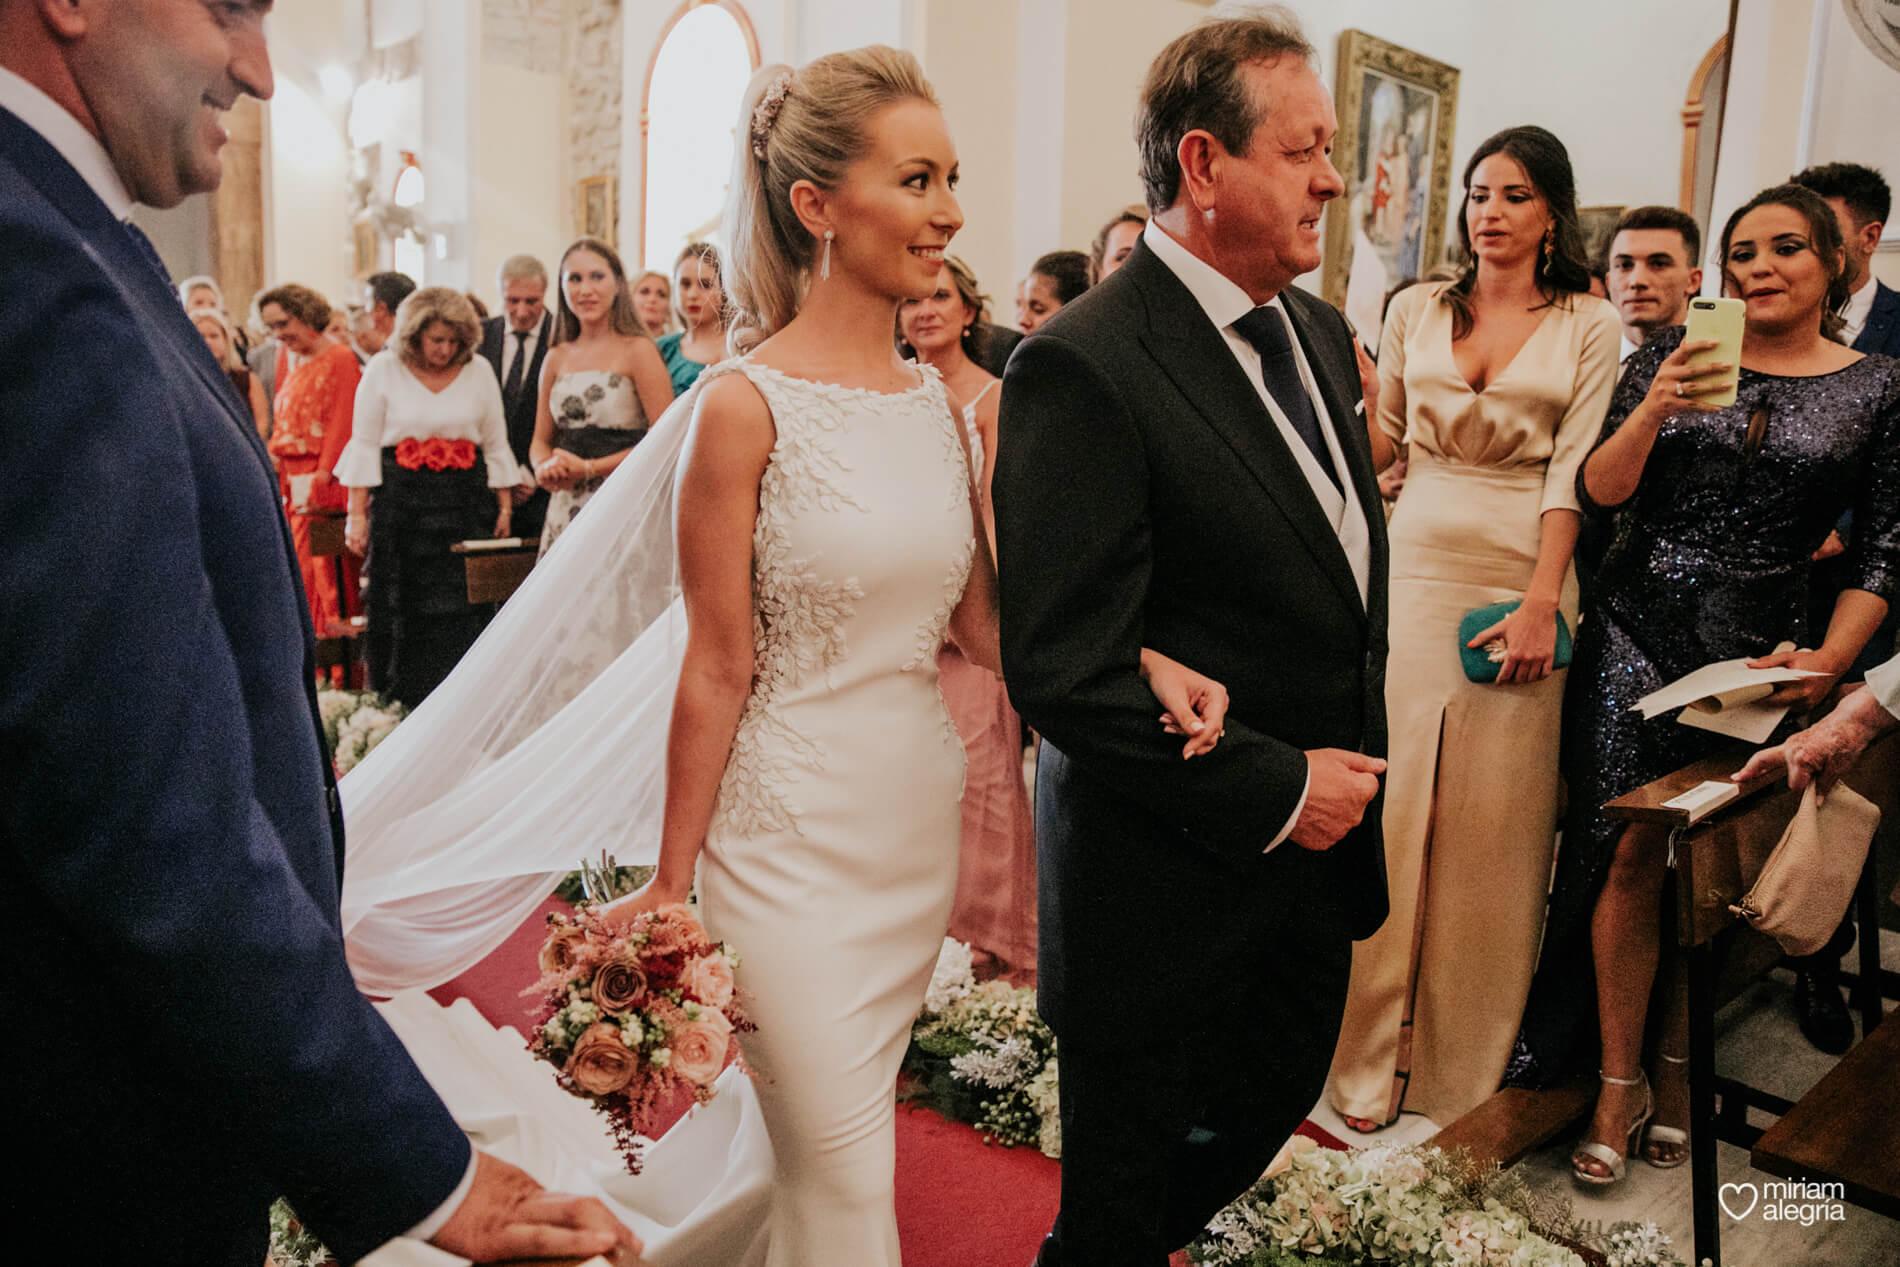 boda-en-almeria-miriam-alegria-79